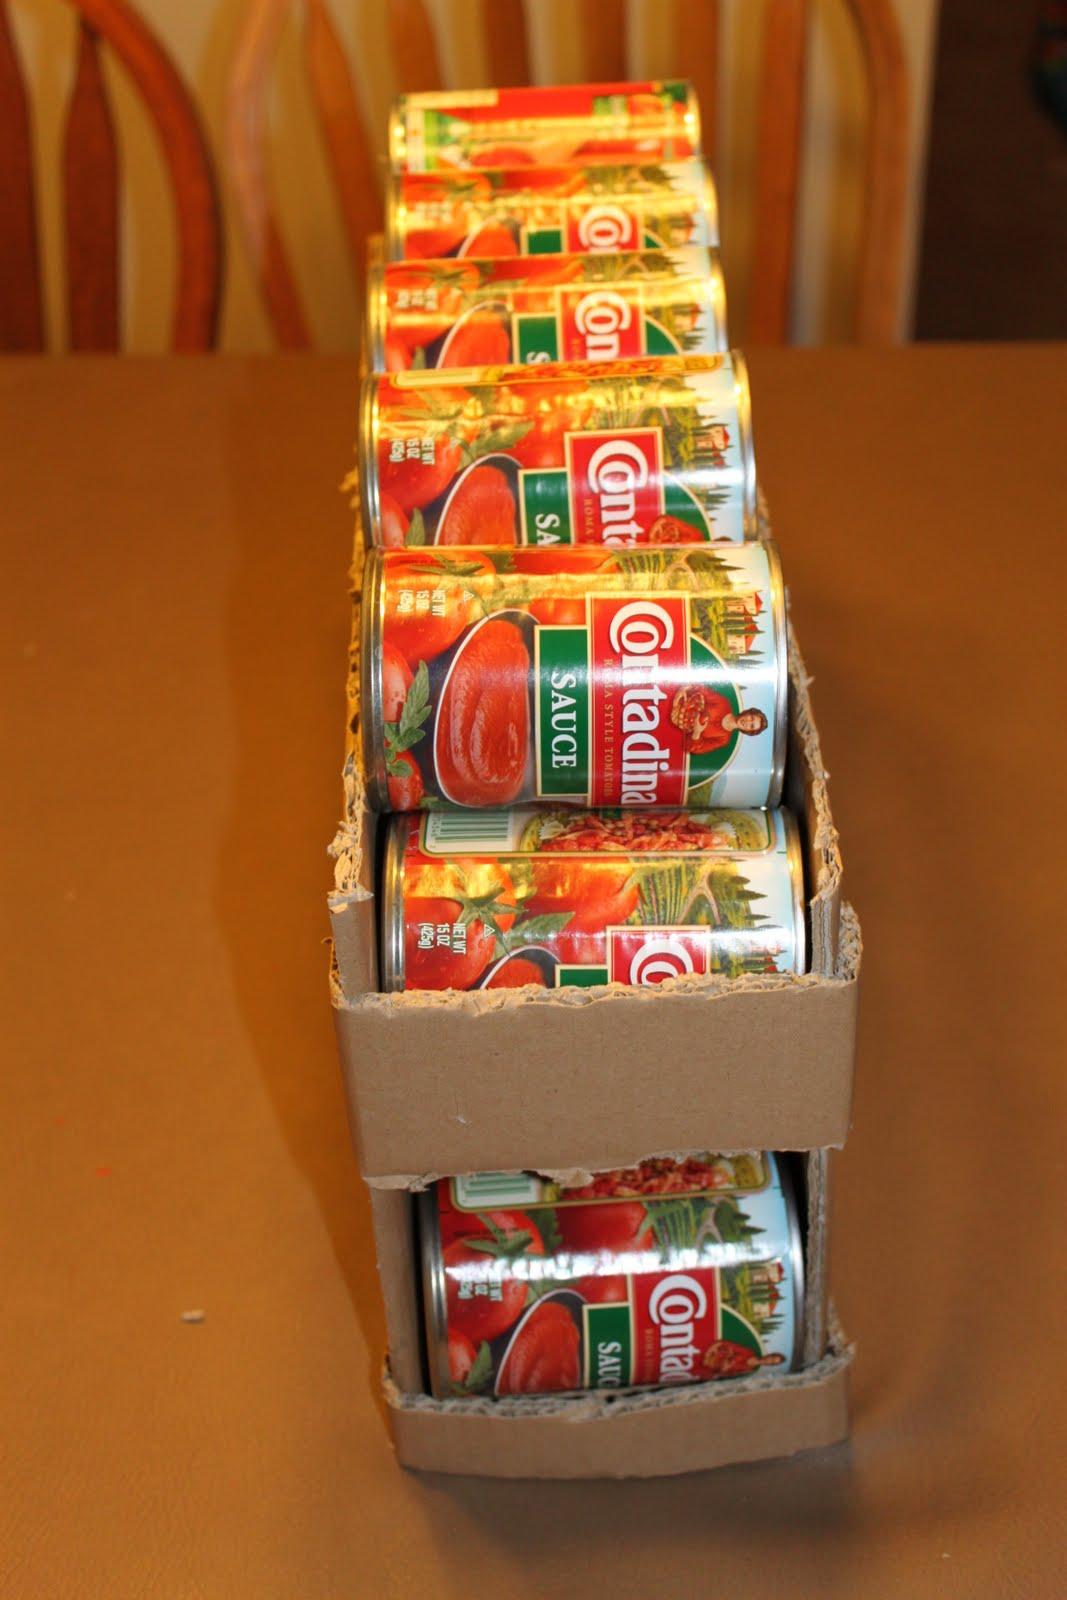 Home food storage & Home food storage: Cardboard Rolling Shelves